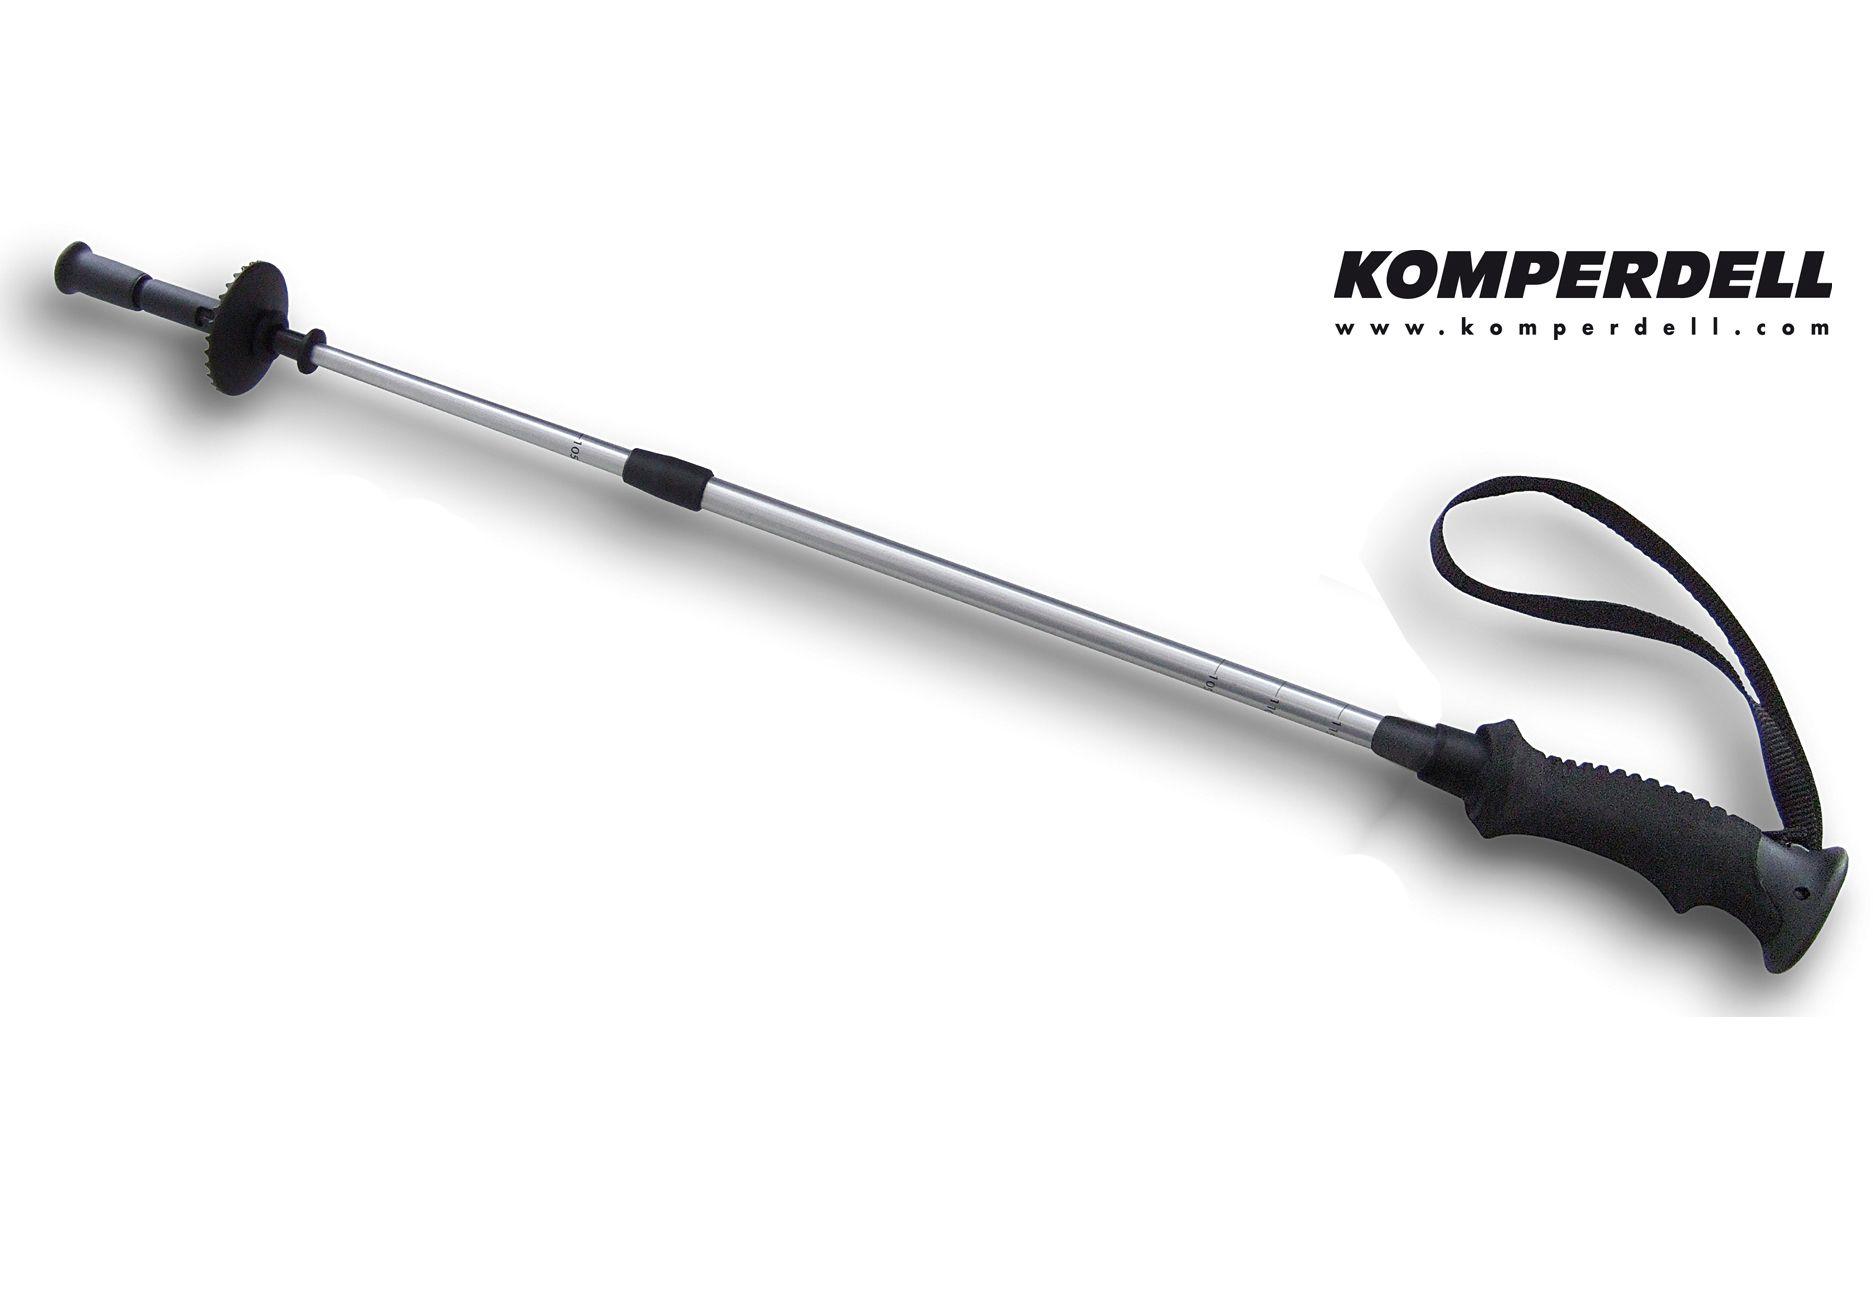 EUROSCHIRM® Euroschirm® Wanderstock, »KOMPERDELL Teleskop-Wanderstock«